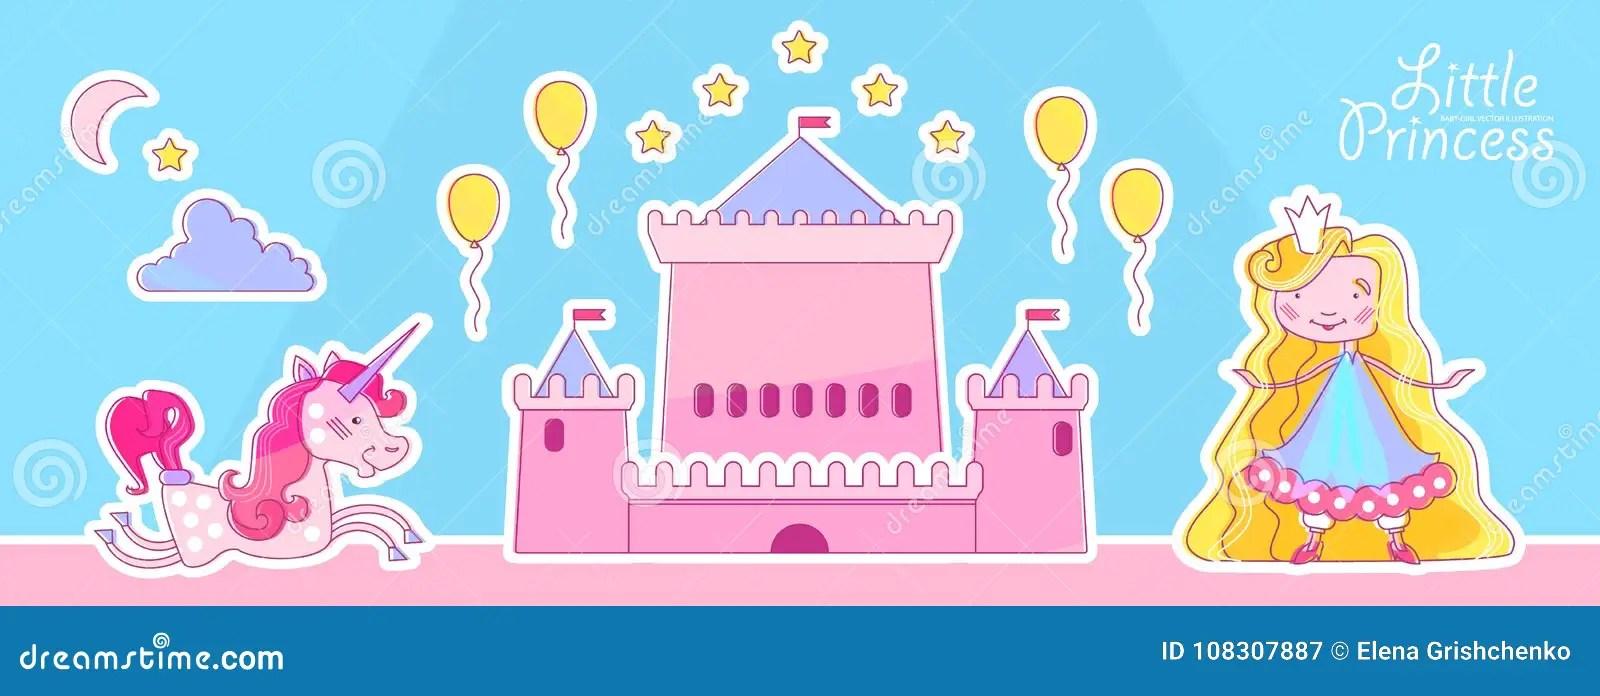 Little Princess Design Template With Magic Wand, Fantastic Castle